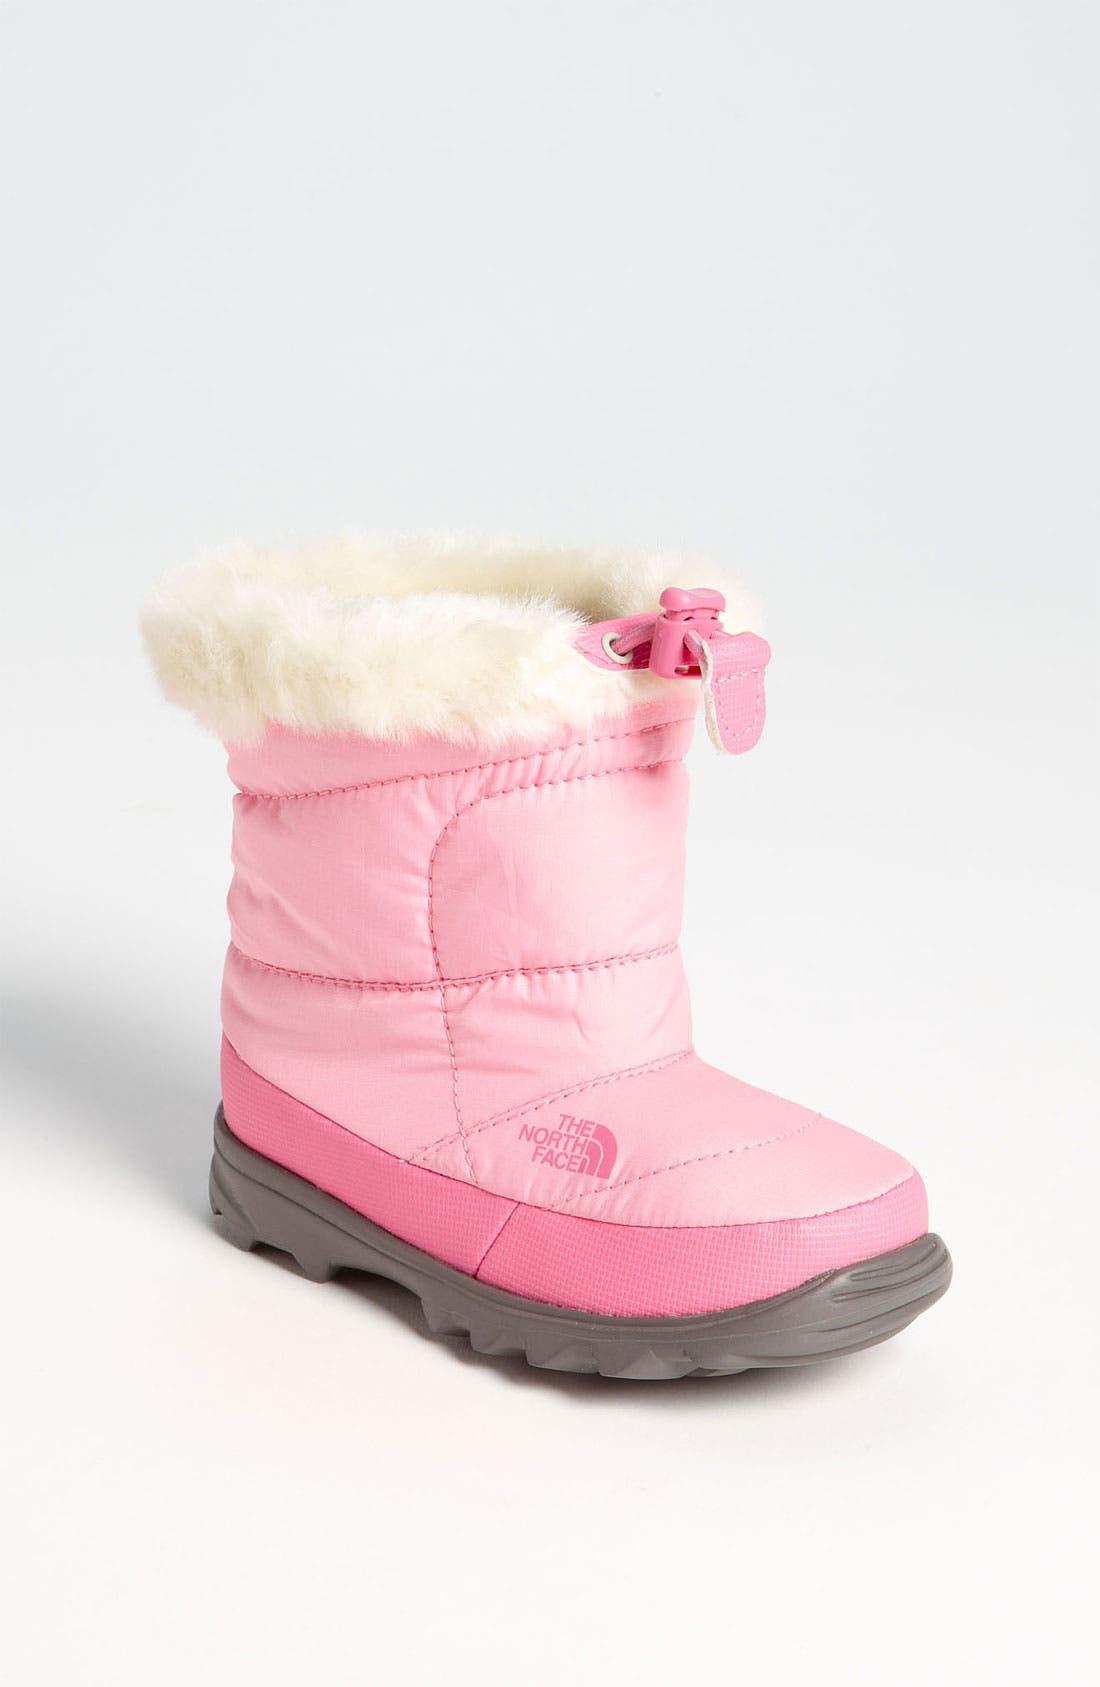 Main Image - The North Face 'Nuptse® II' Boot (Walker & Toddler)